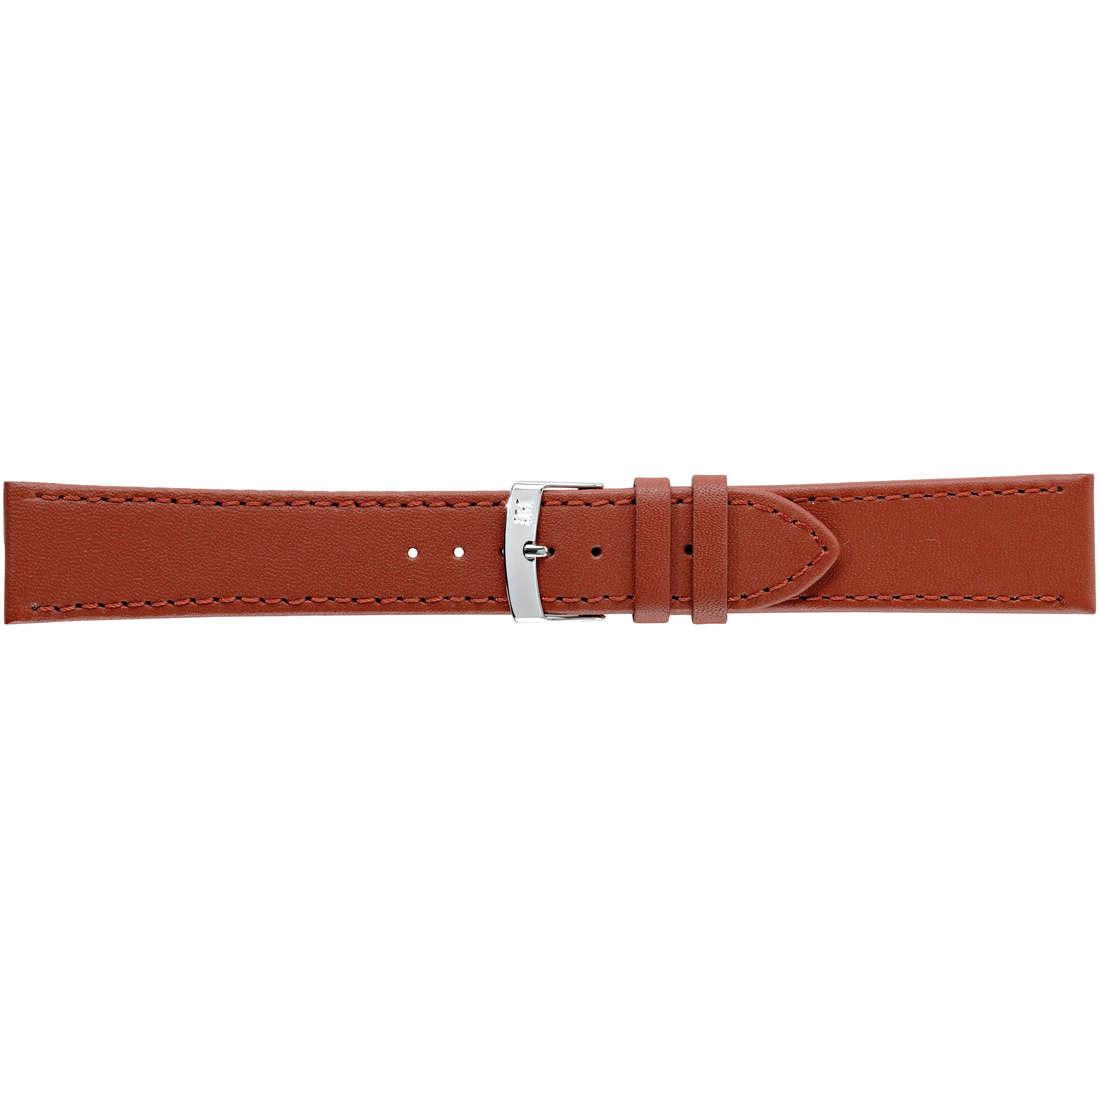 watch watch bands watch straps man Morellato Performance A01X2619875141CR20